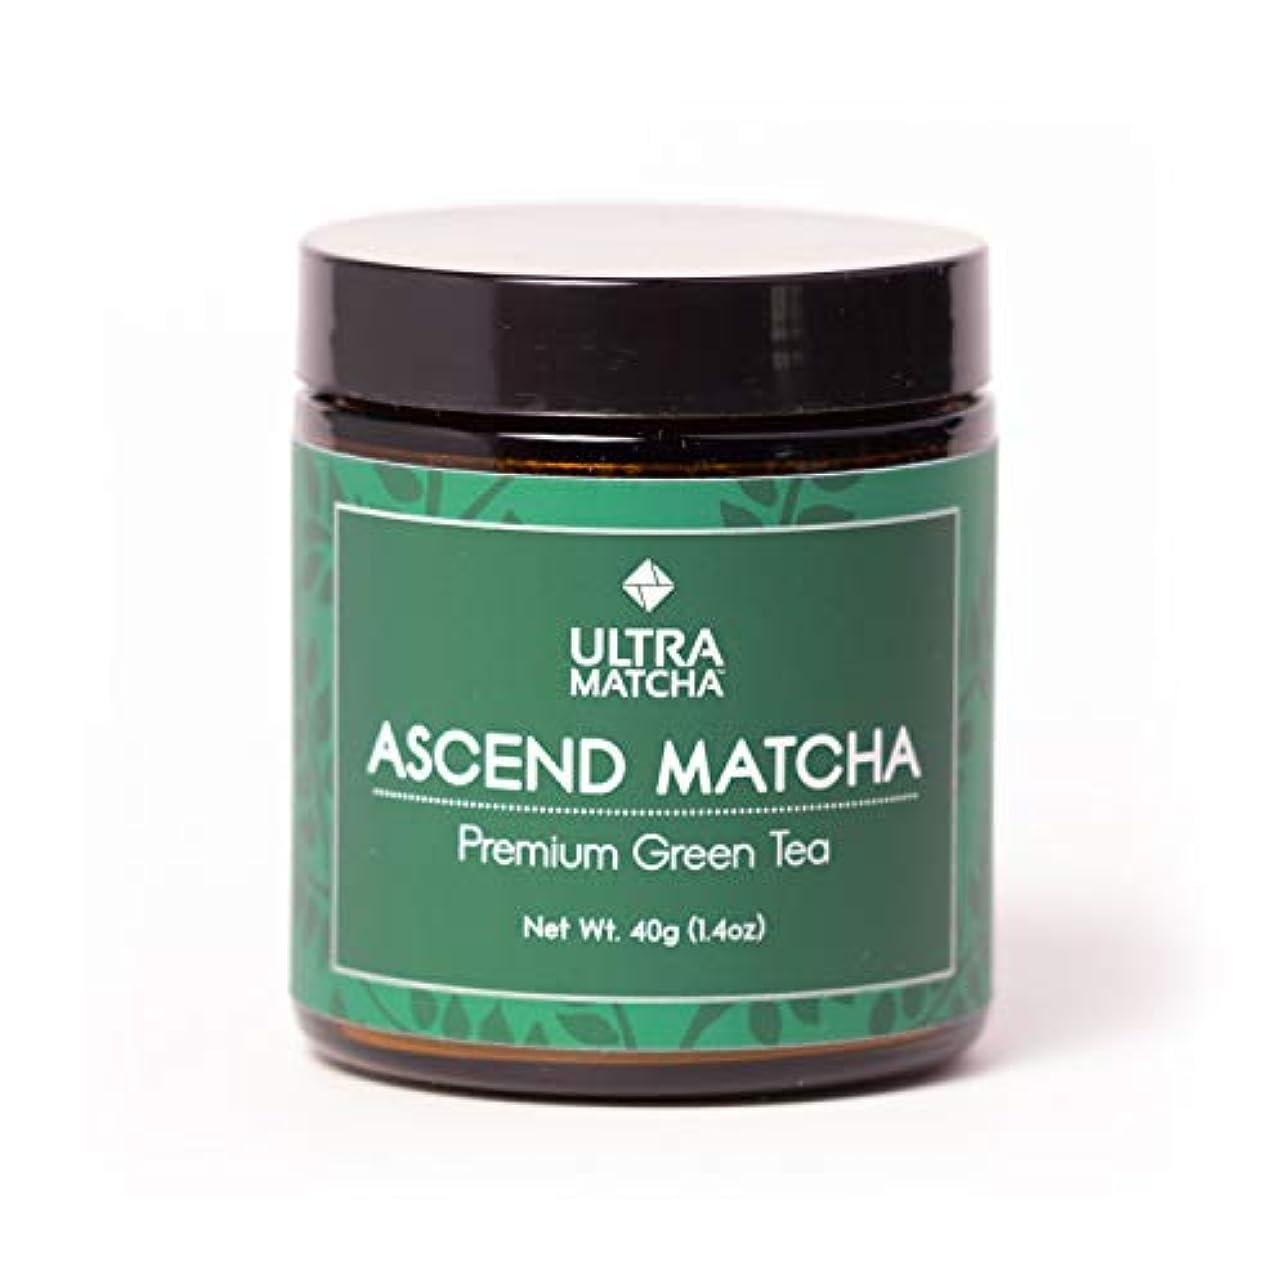 Ascend抹茶 – プレミアムグレード – 40 g Jar – ウルトラ抹茶グリーンティー Premium Grade - 40g Jar グリーン